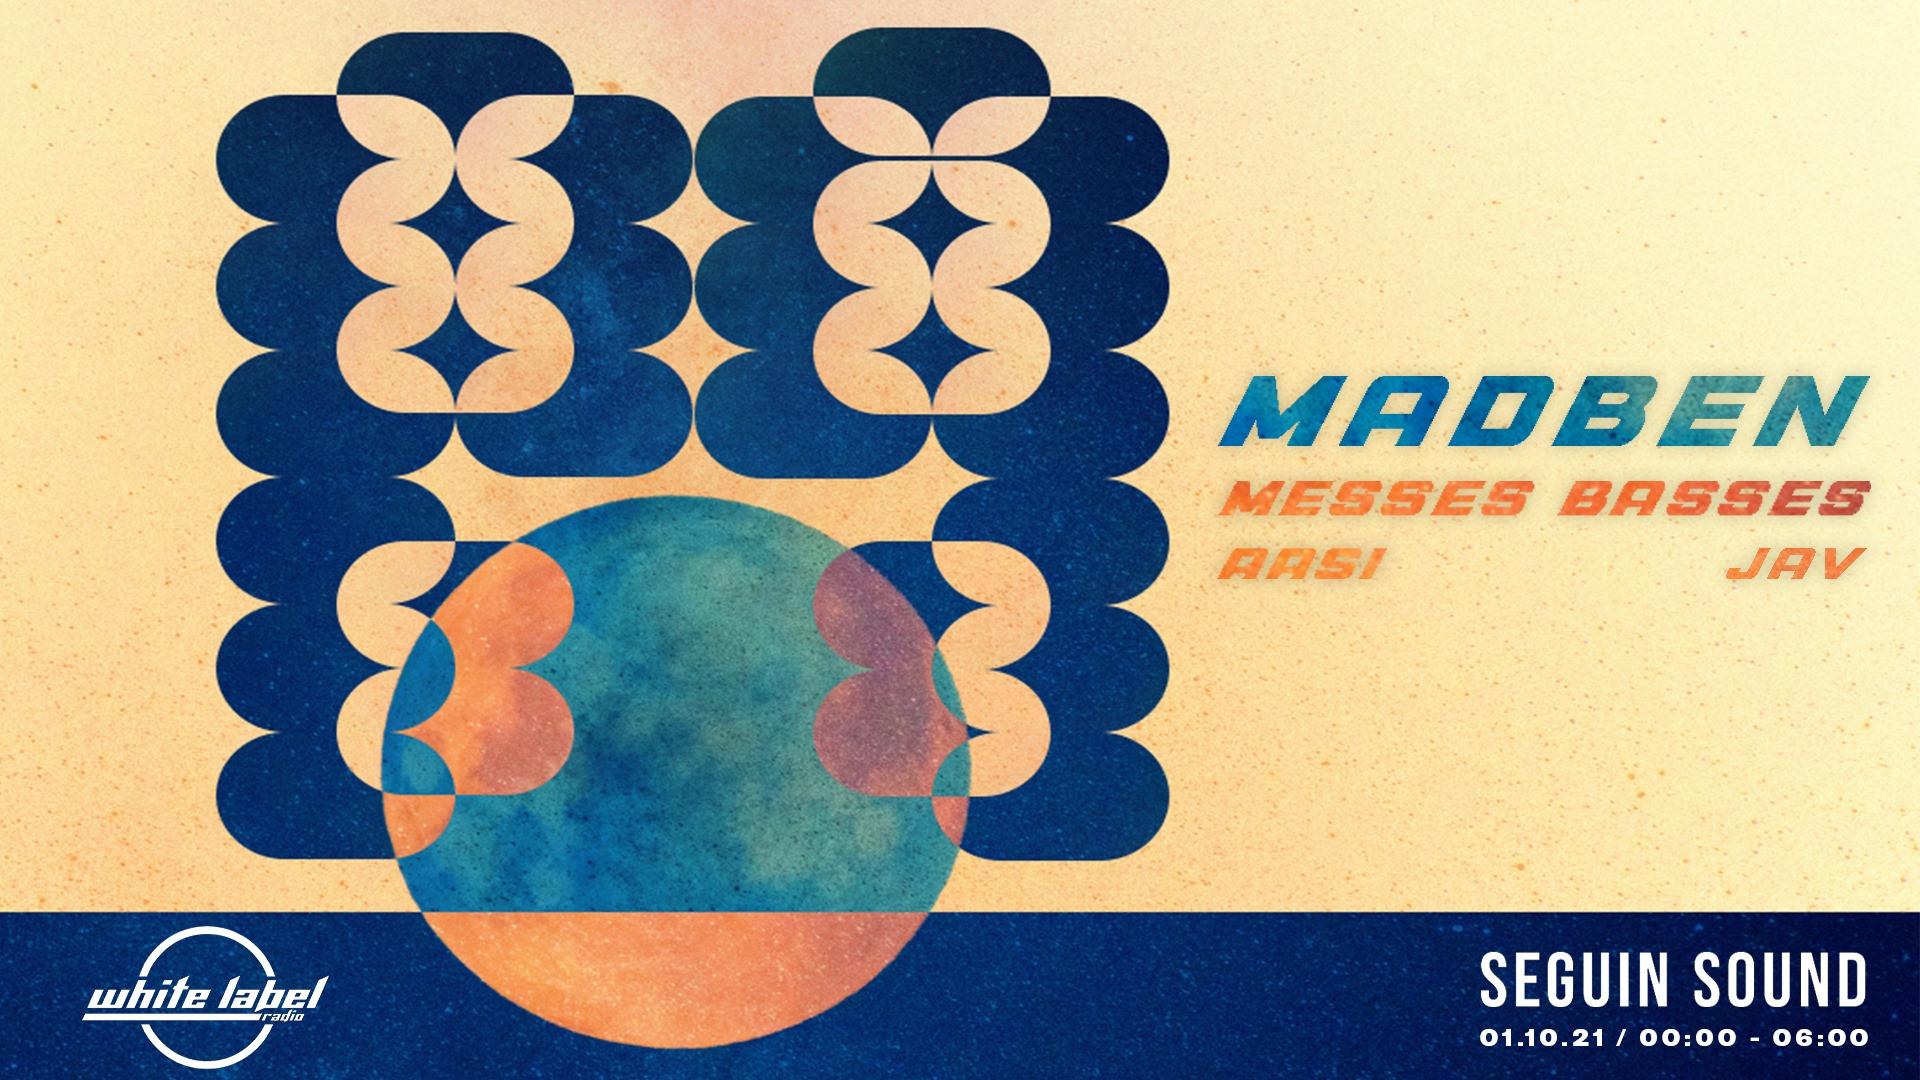 White Label Radio invite Madben & Messes Basses